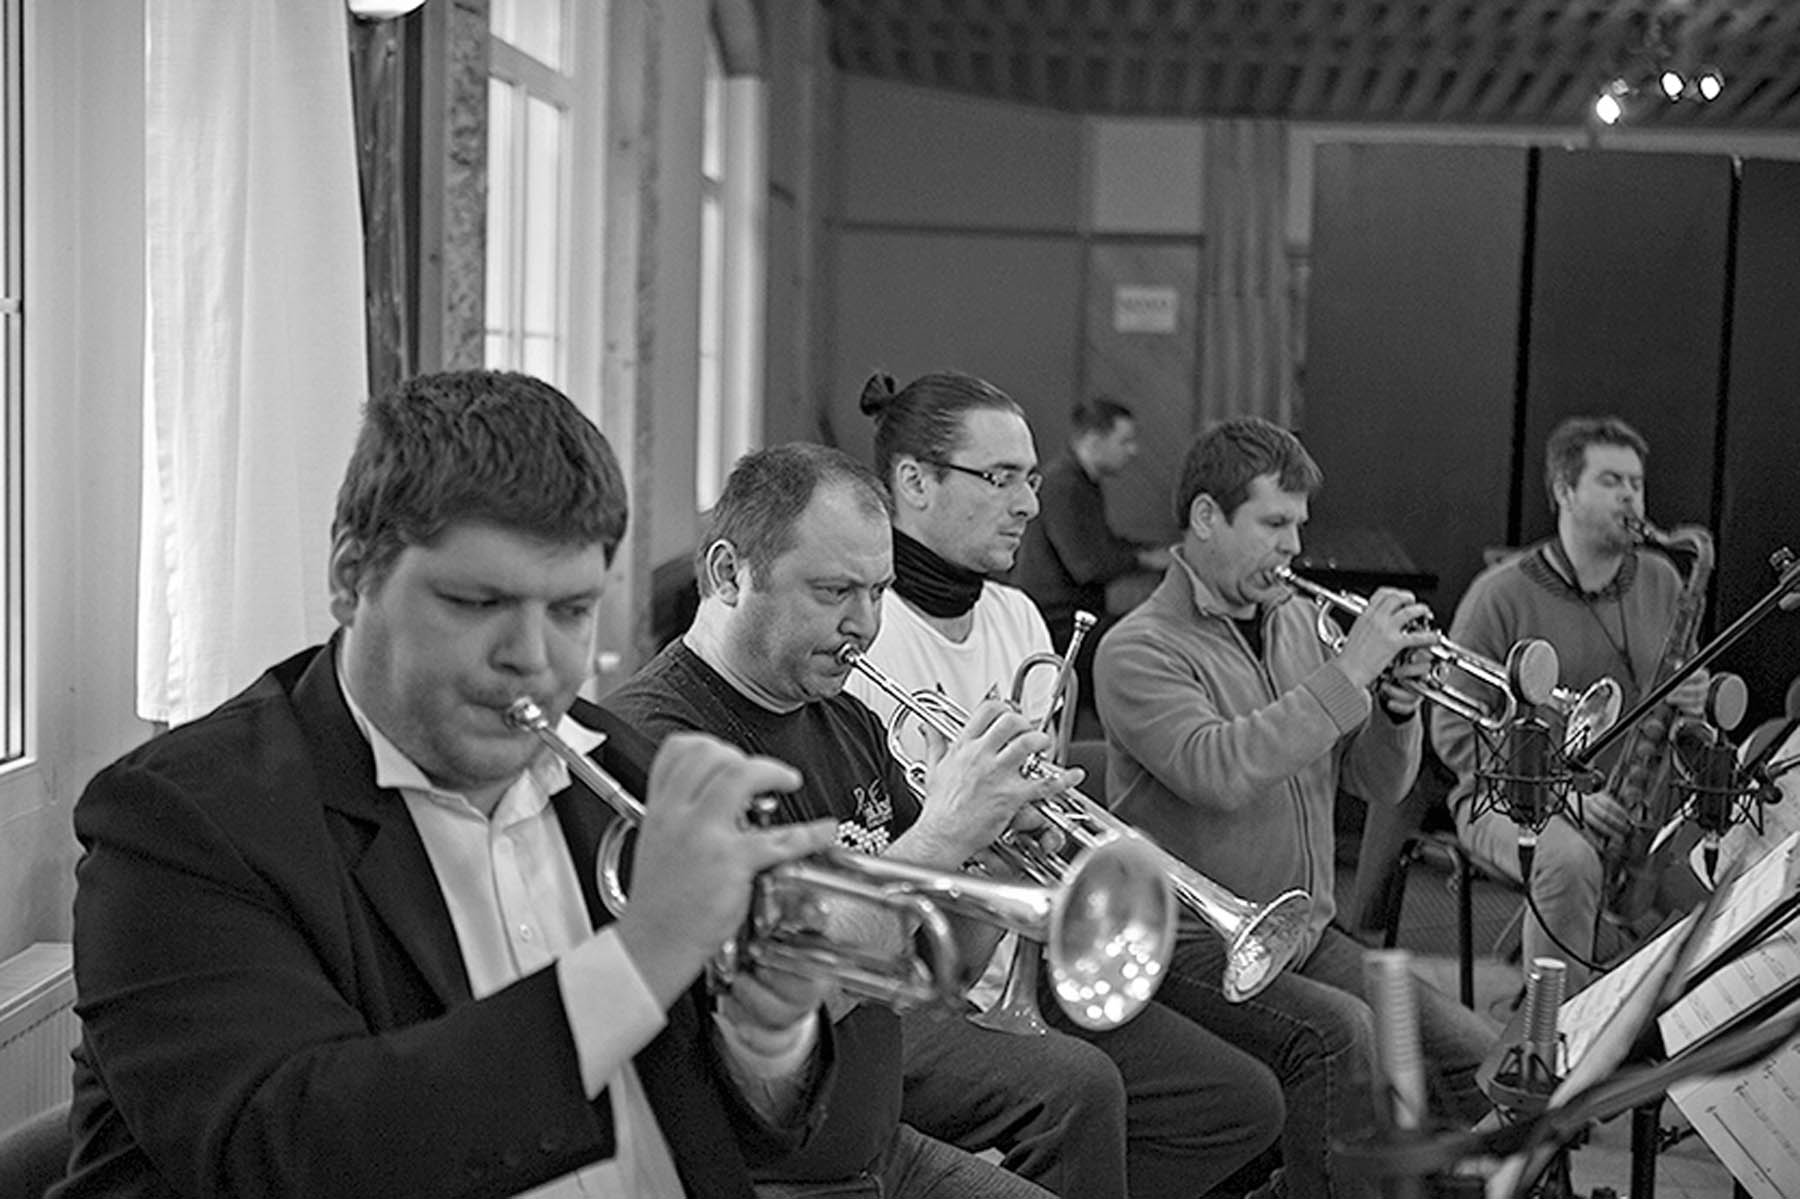 Concept Art Orchestra Prague Six Balcarova Brunner Jirucha Kristan Soukup Sykora